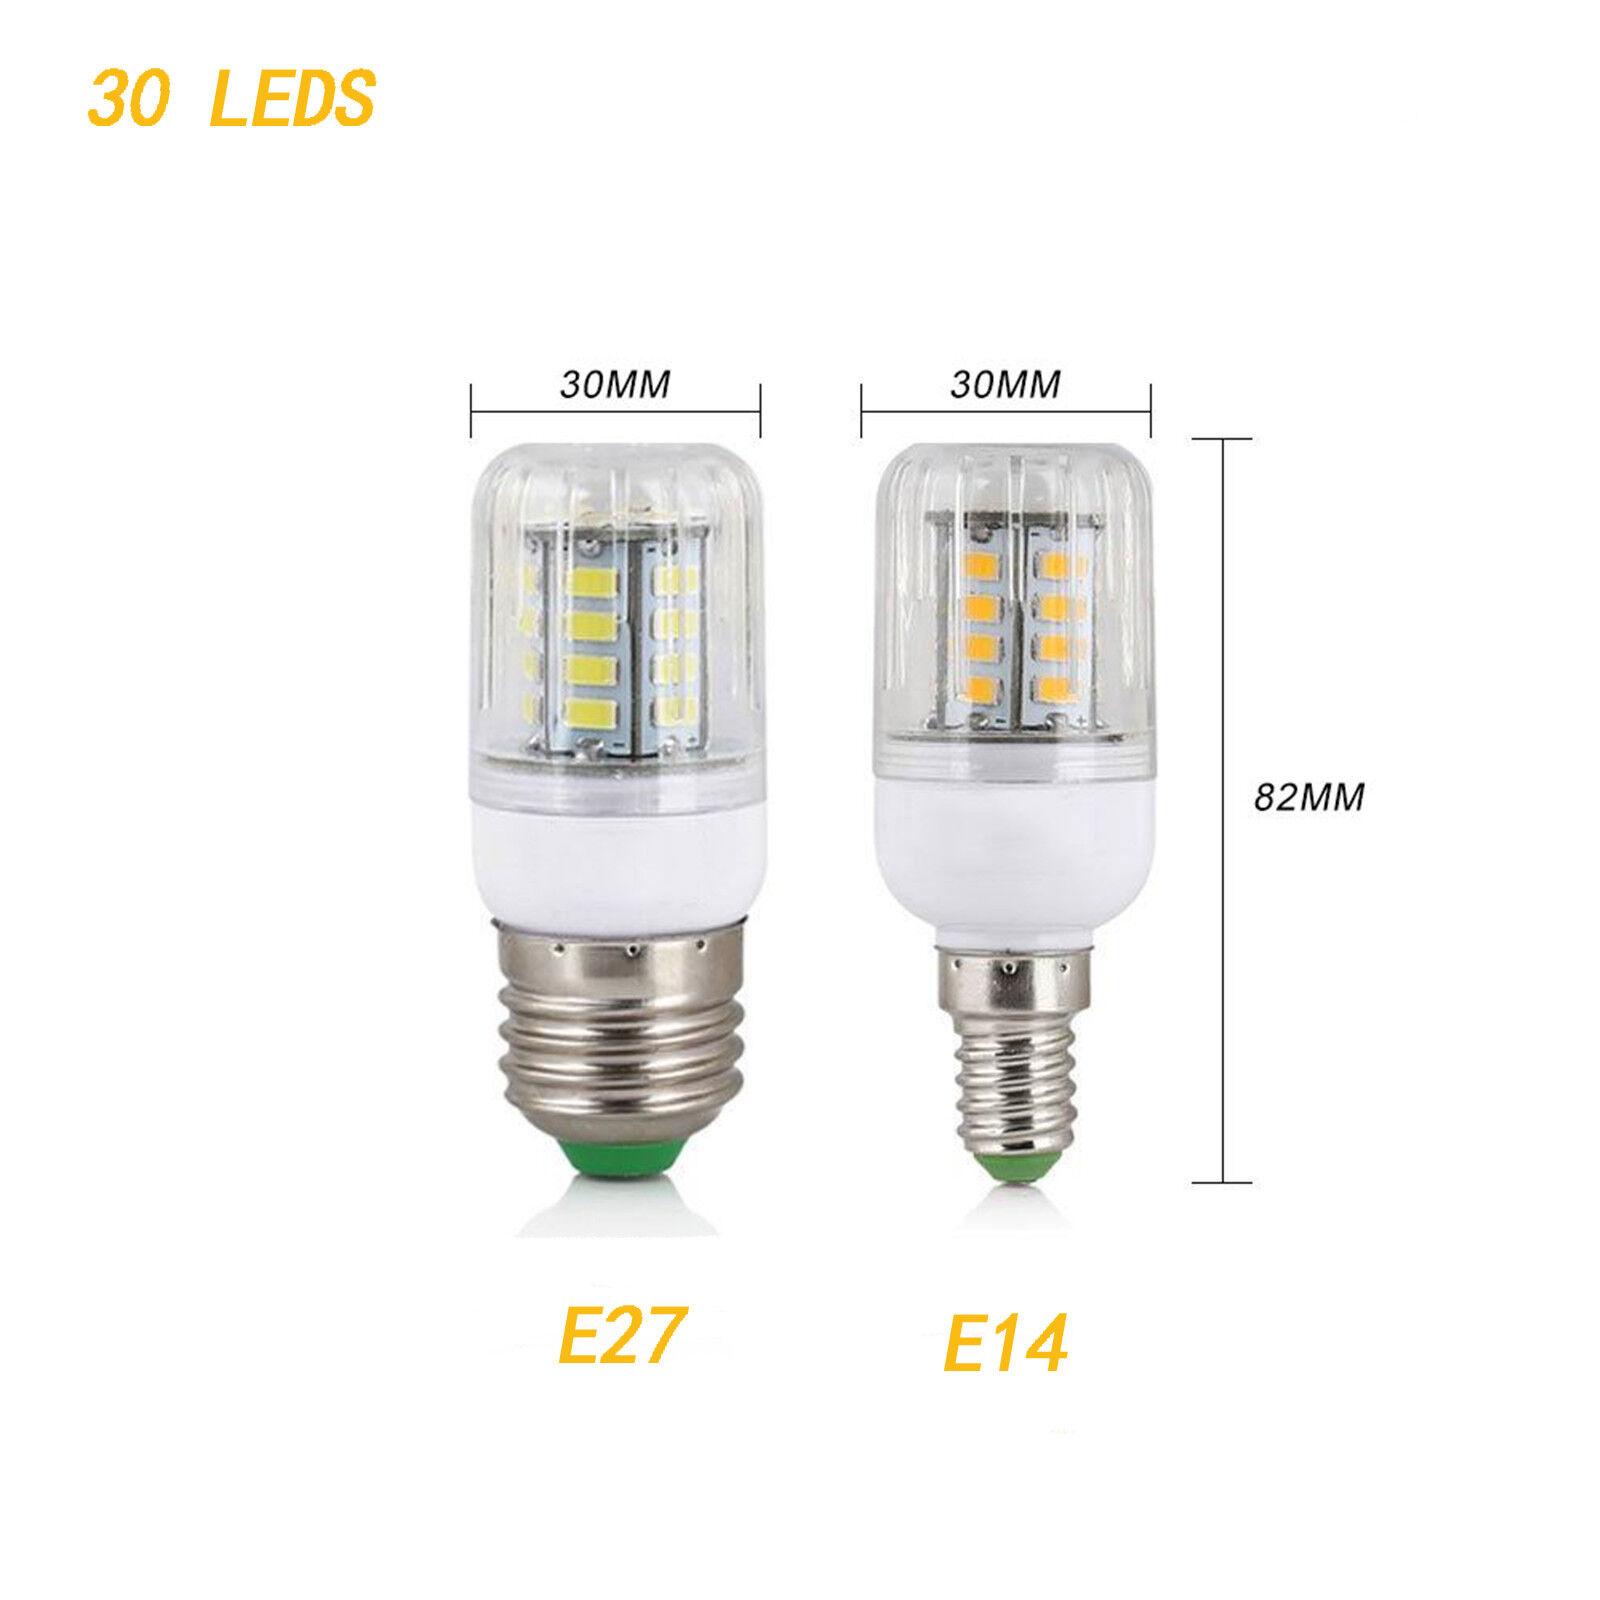 E27 E14 7W 9W 12W 15W 20W 25W 5730 SMD LED Corn Bulb Lamp Light Bright 110/220V 9